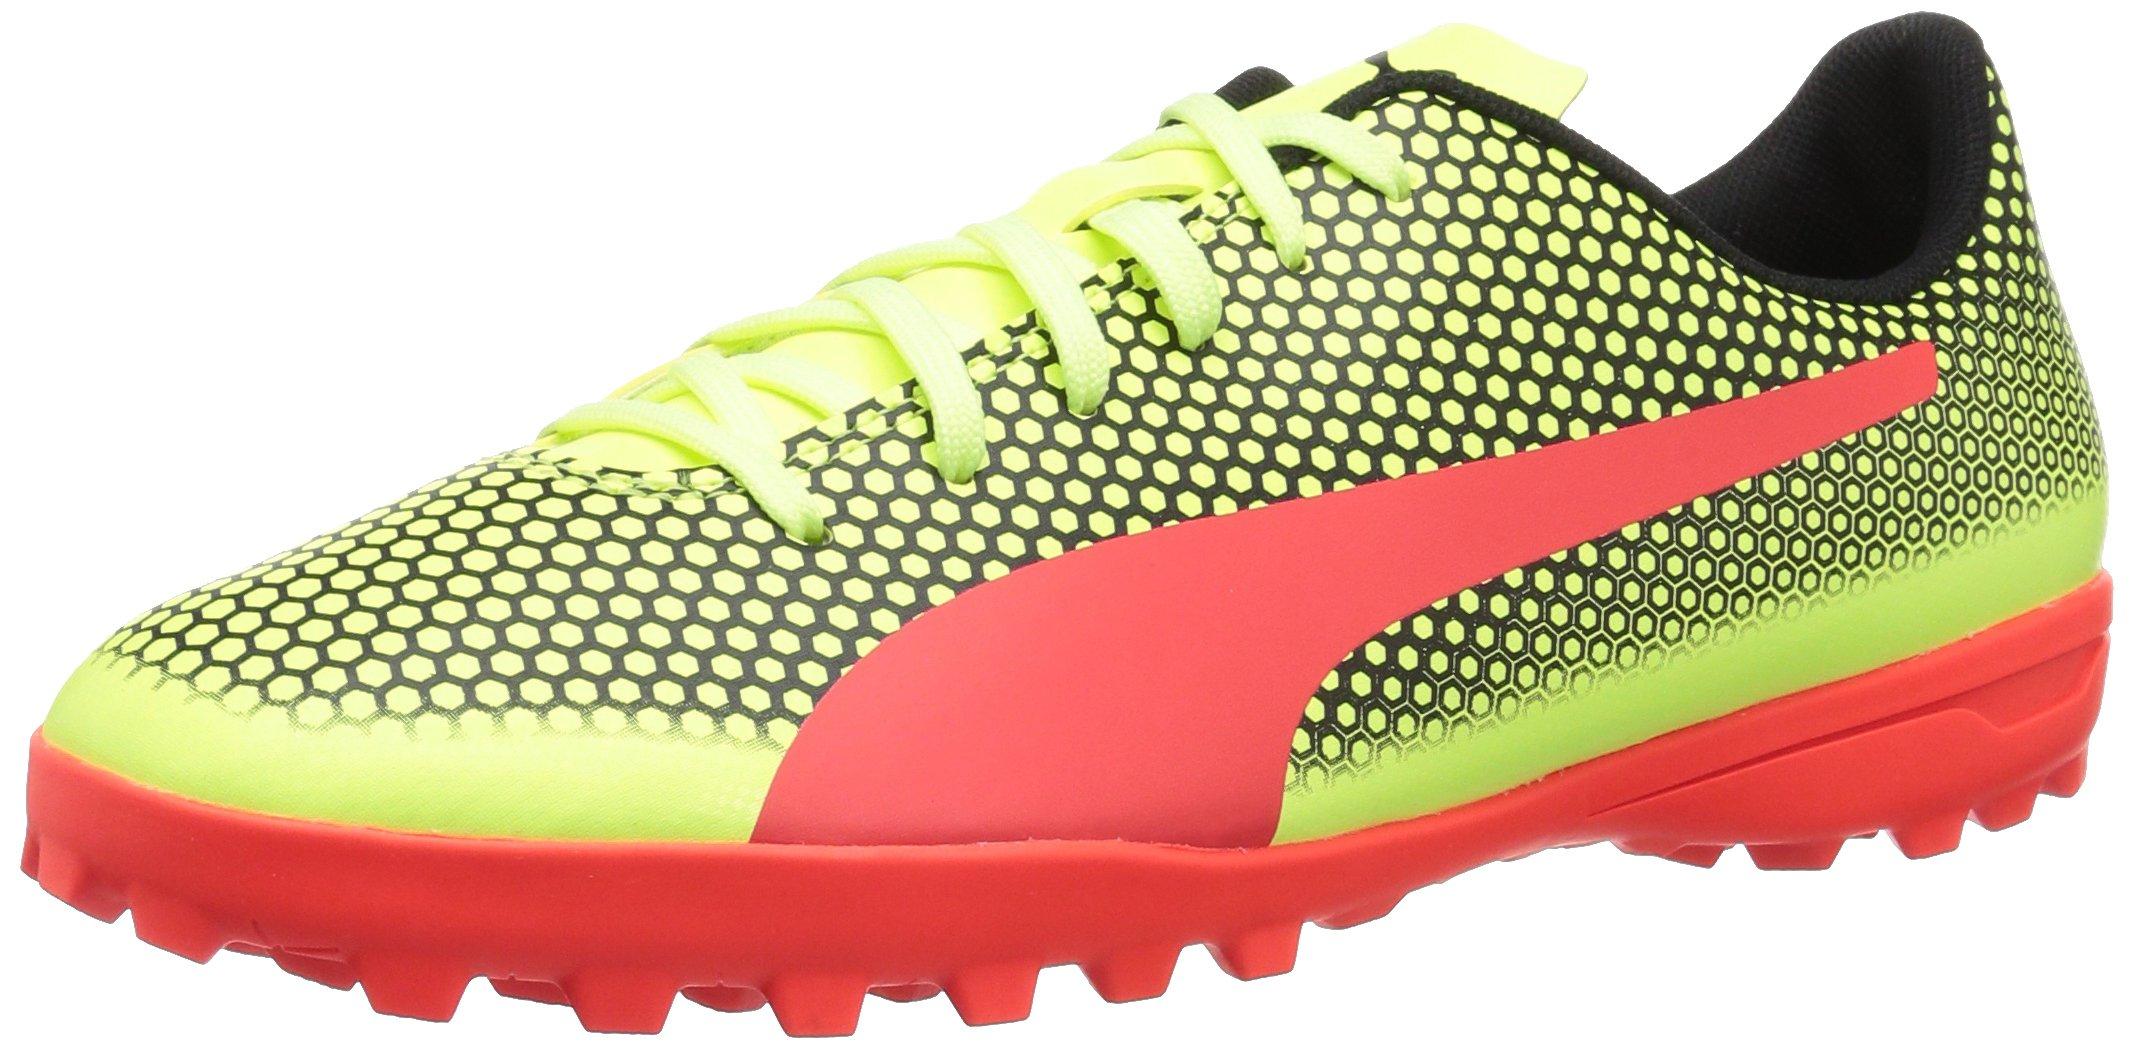 PUMA Men's Spirit Turf Trainer Soccer Shoe, Fizzy Yellow-Red Blast Black, 8.5 M US by PUMA